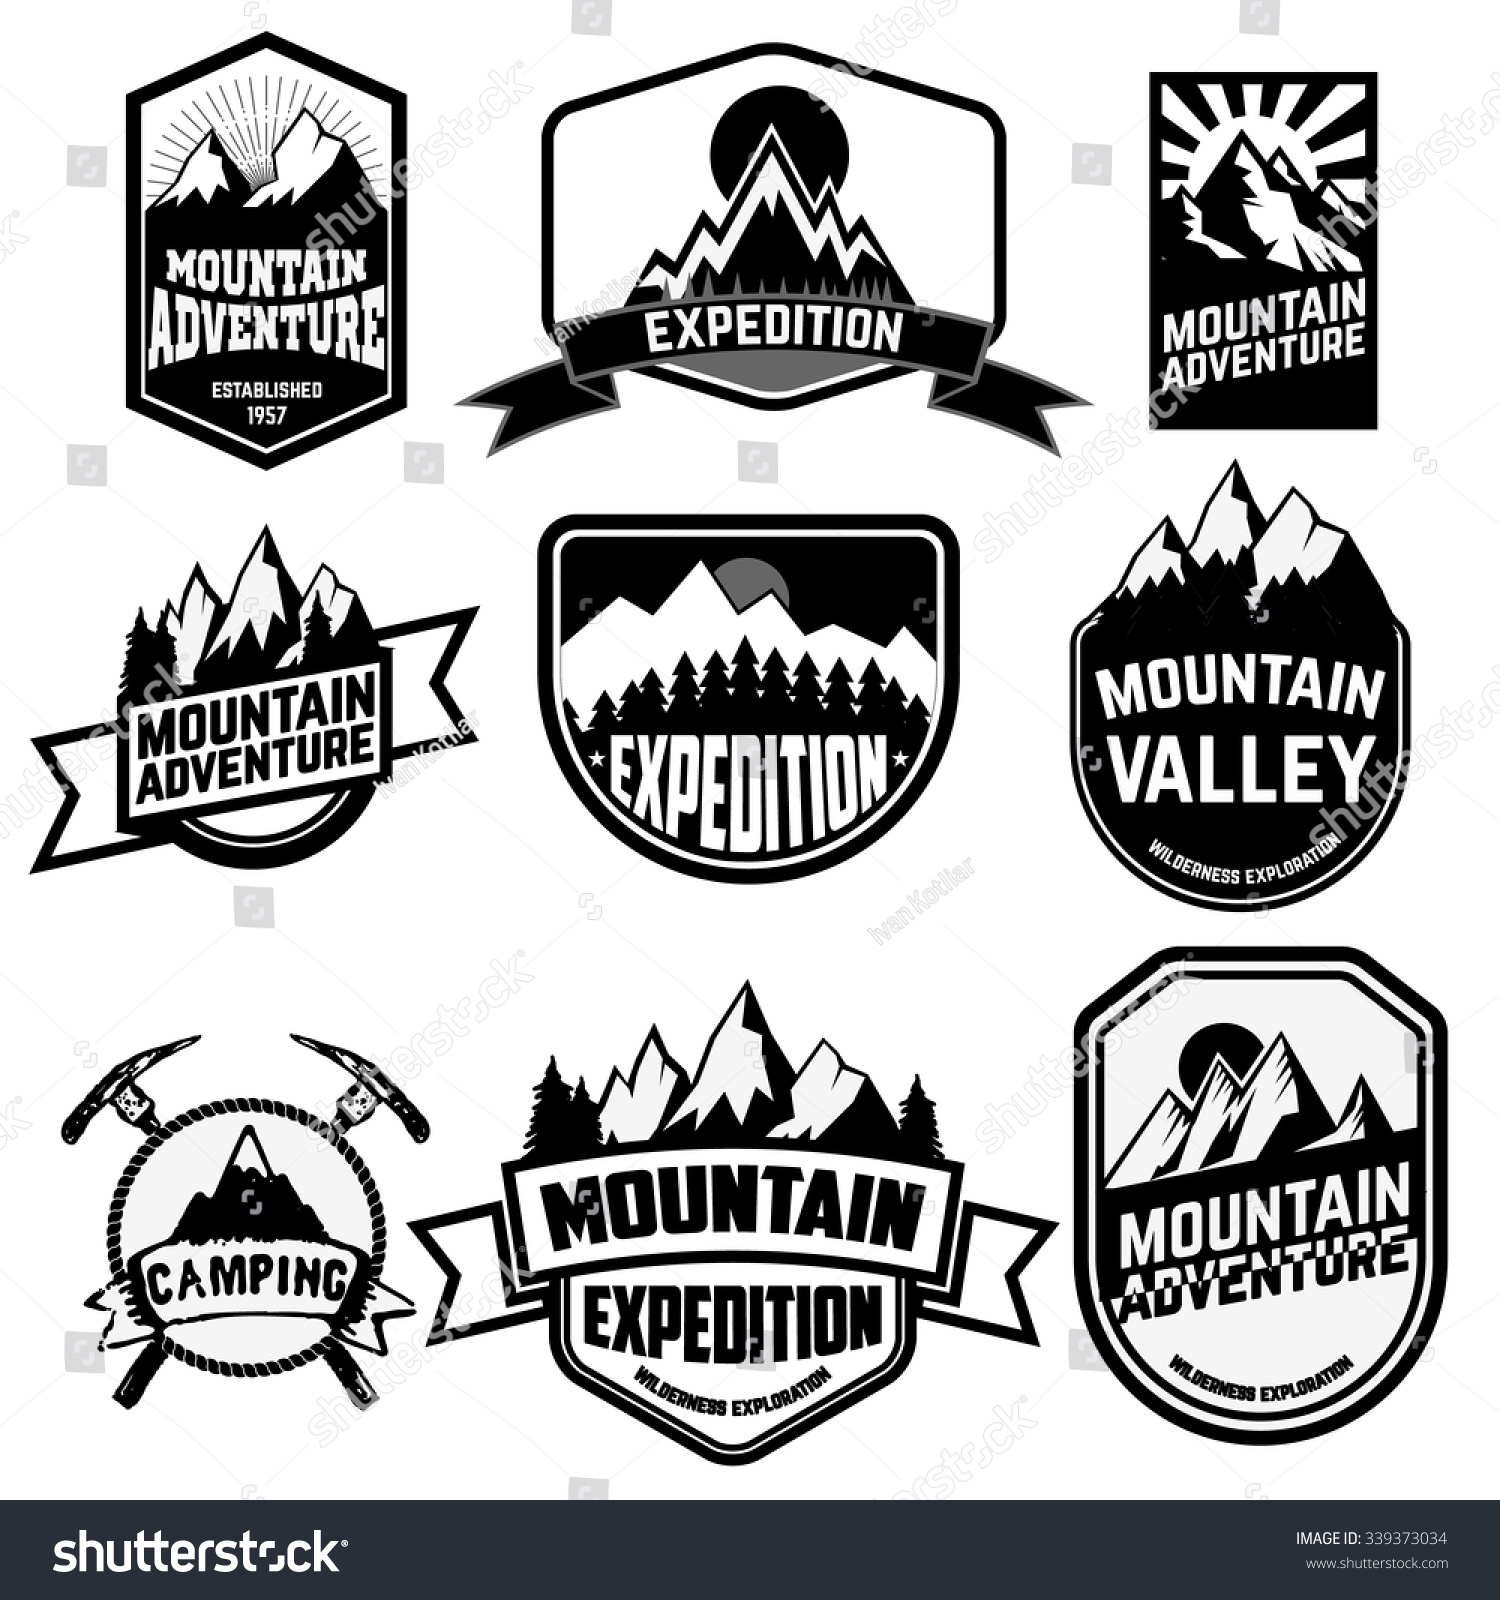 Royalty-free Set of vintage style mountains… #339373034 Stock Photo ...